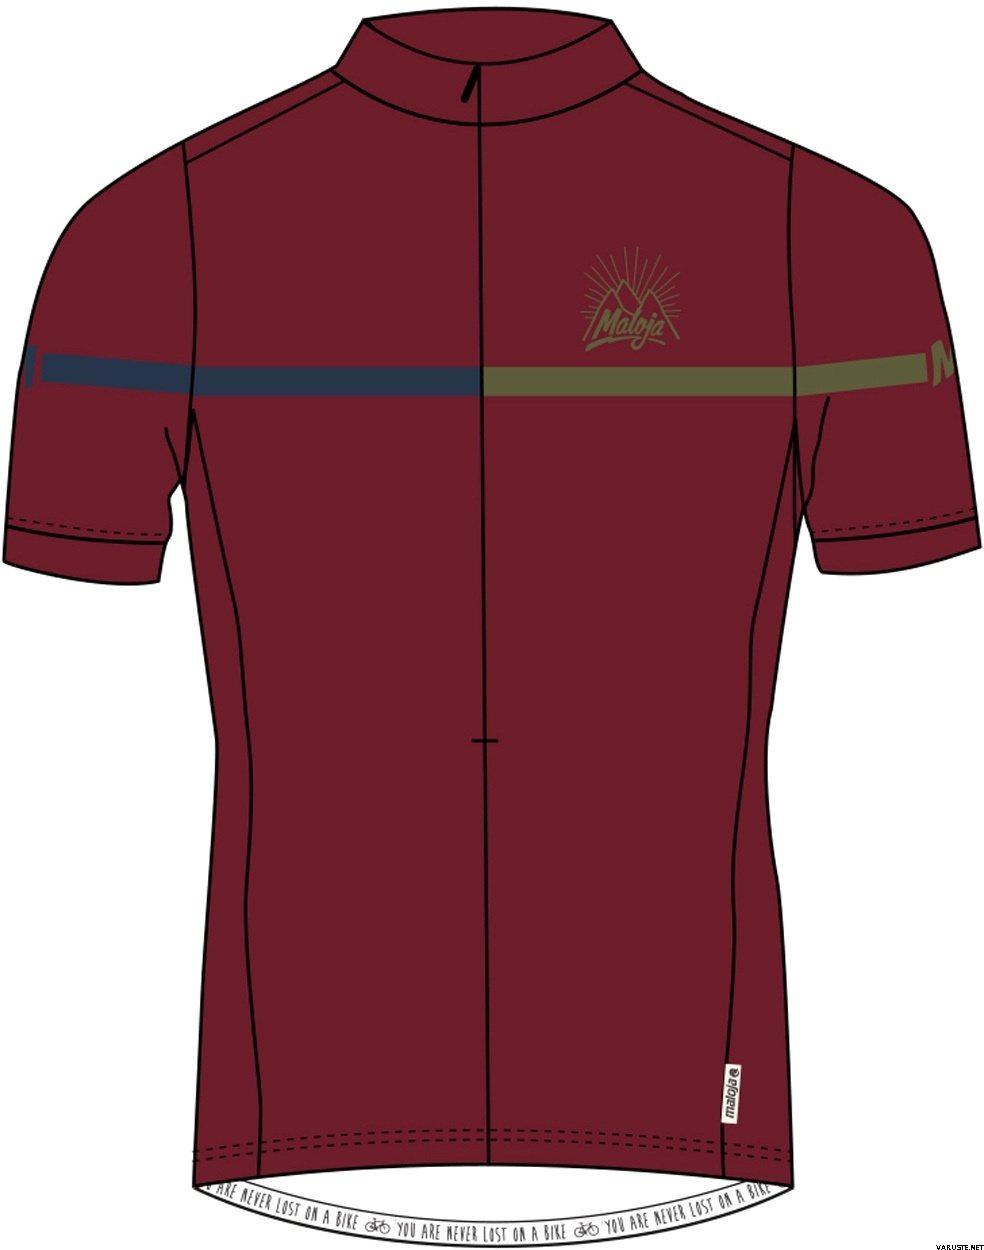 7703f6d9f Maloja BusterM 1 2 Short Sleeve Bike Jersey